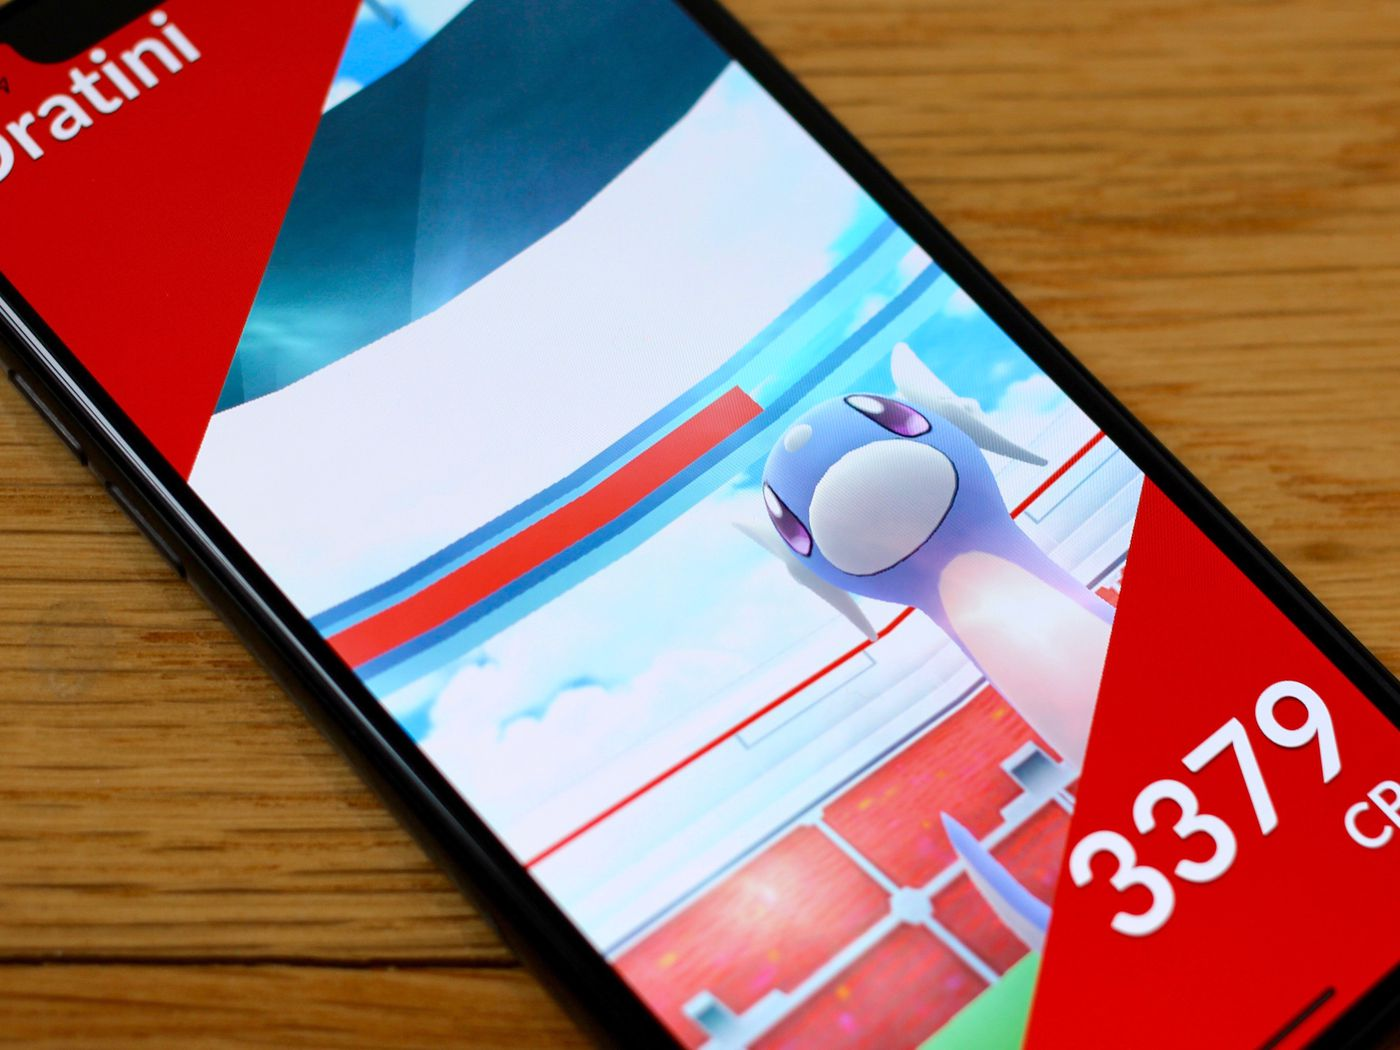 Pokémon Go testing new 'lunch hour' raid events - Polygon